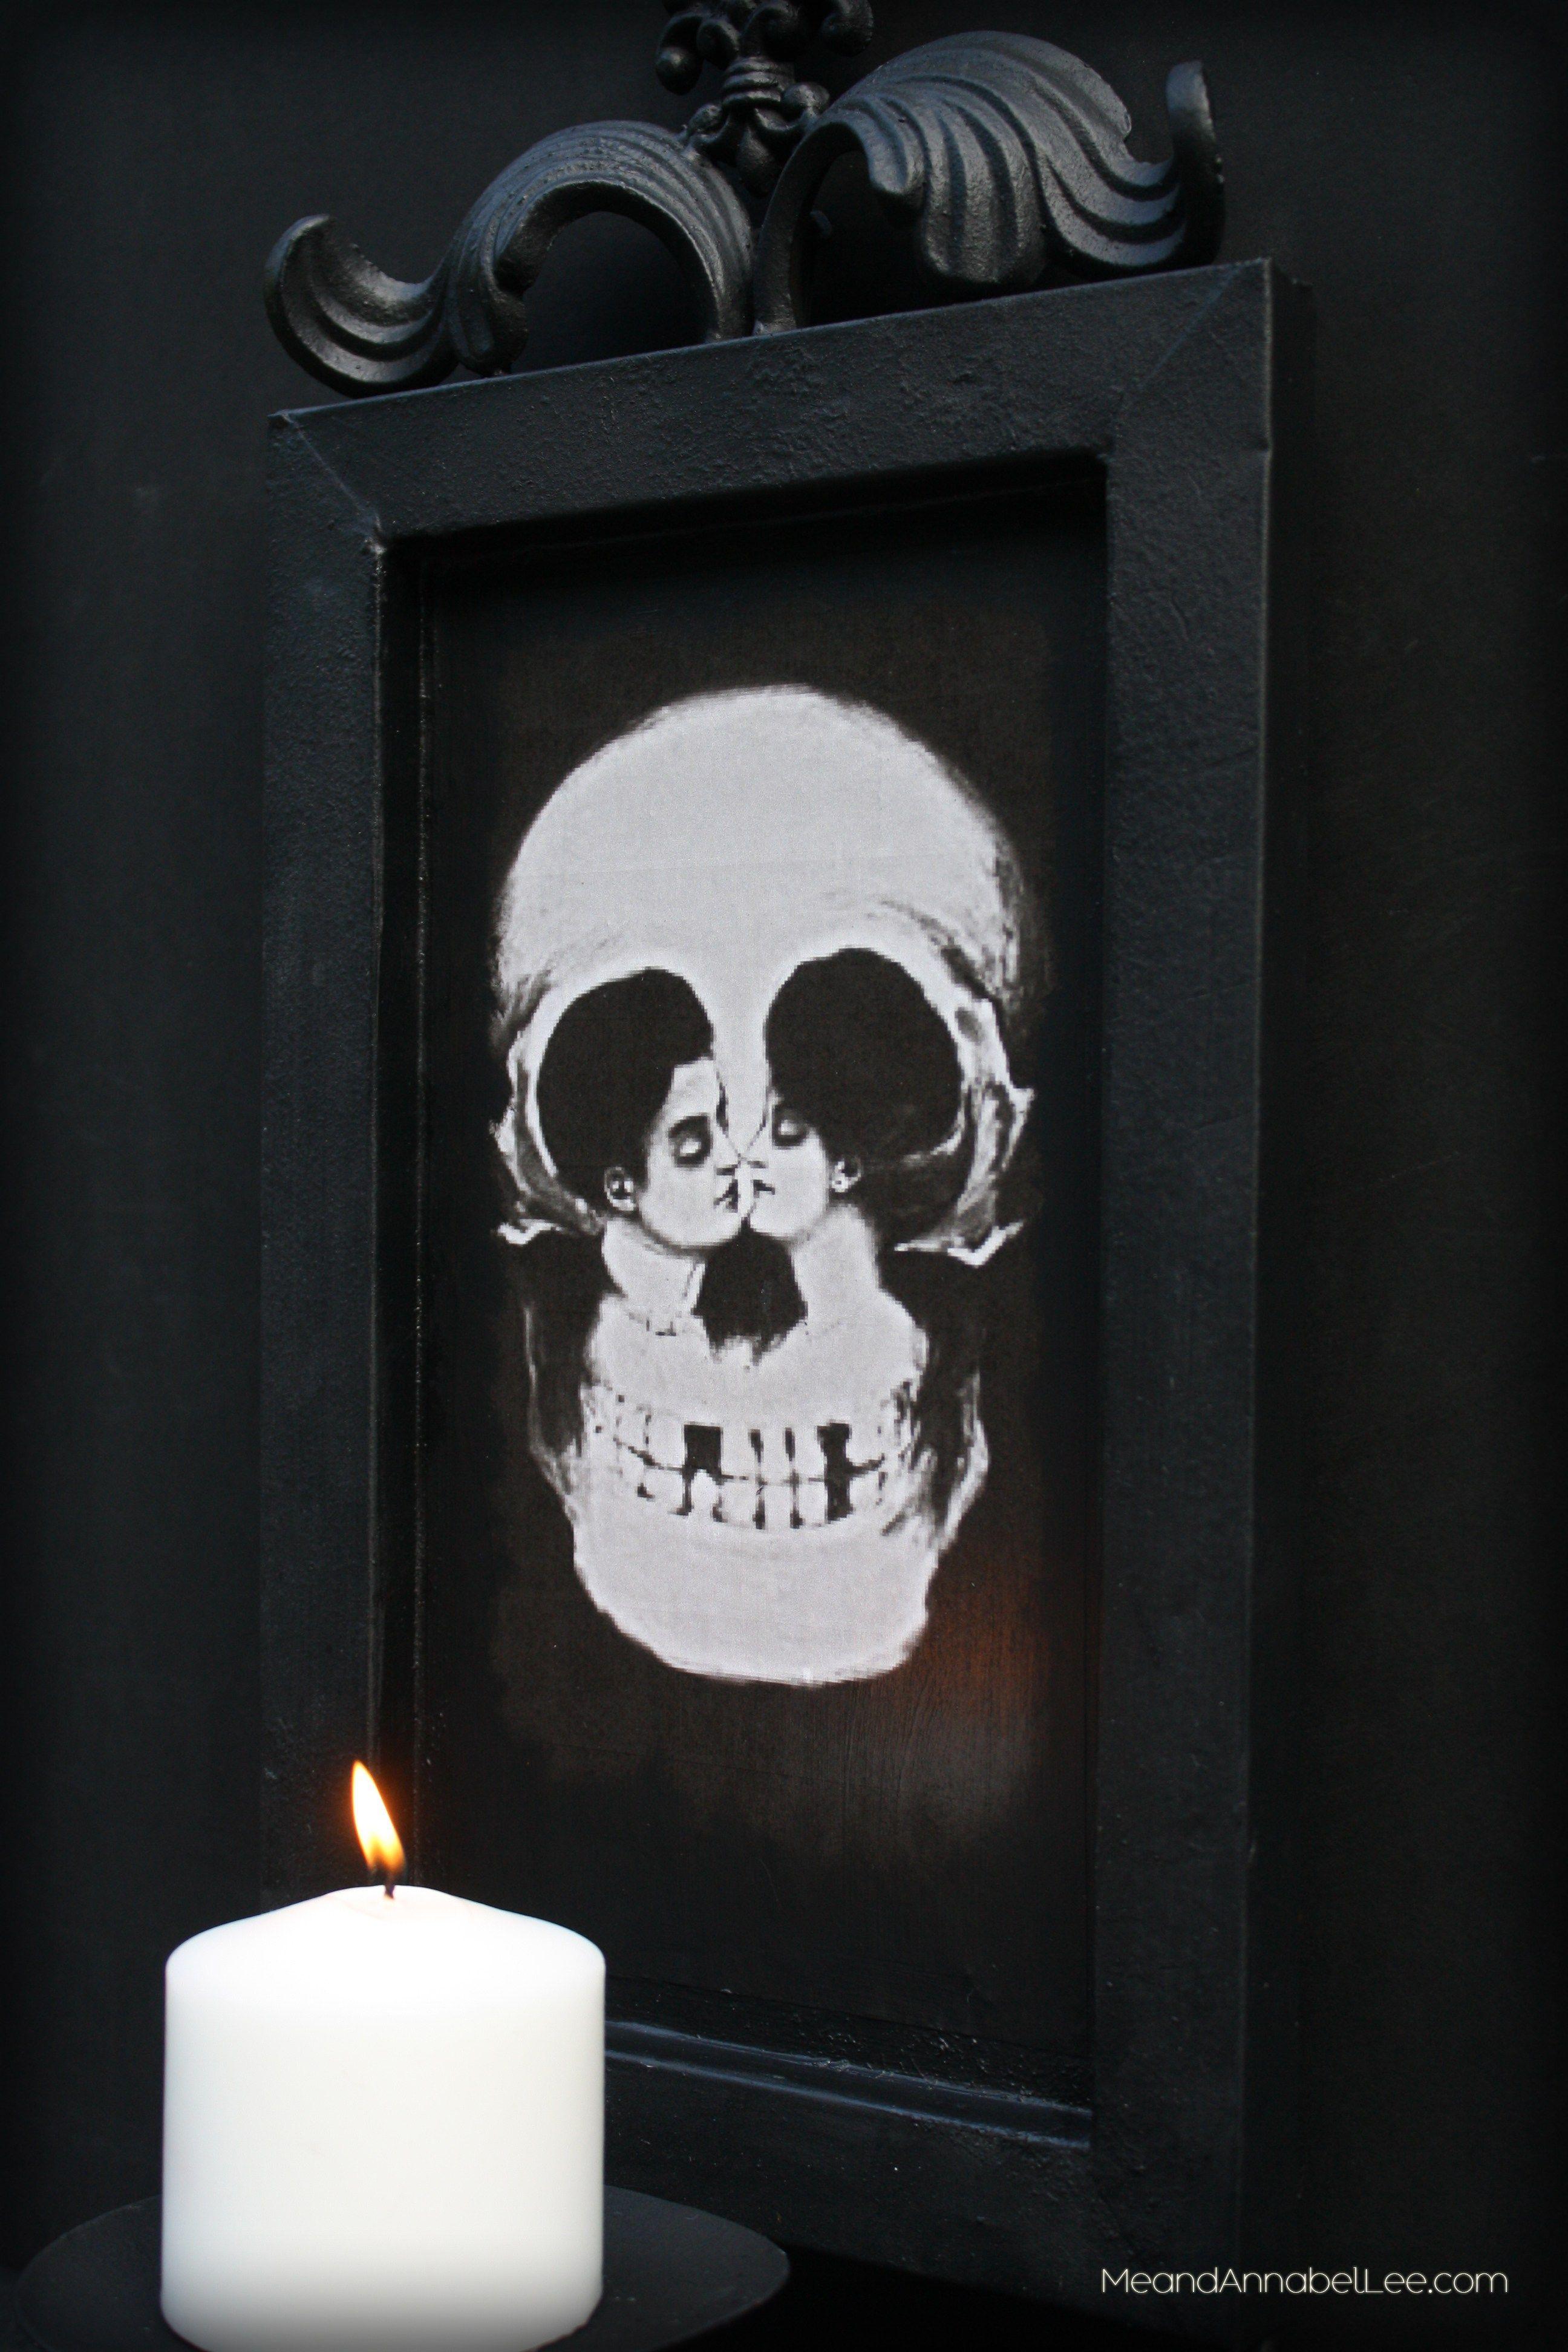 Metamorphic skull art transfer an image to metal using mod podge